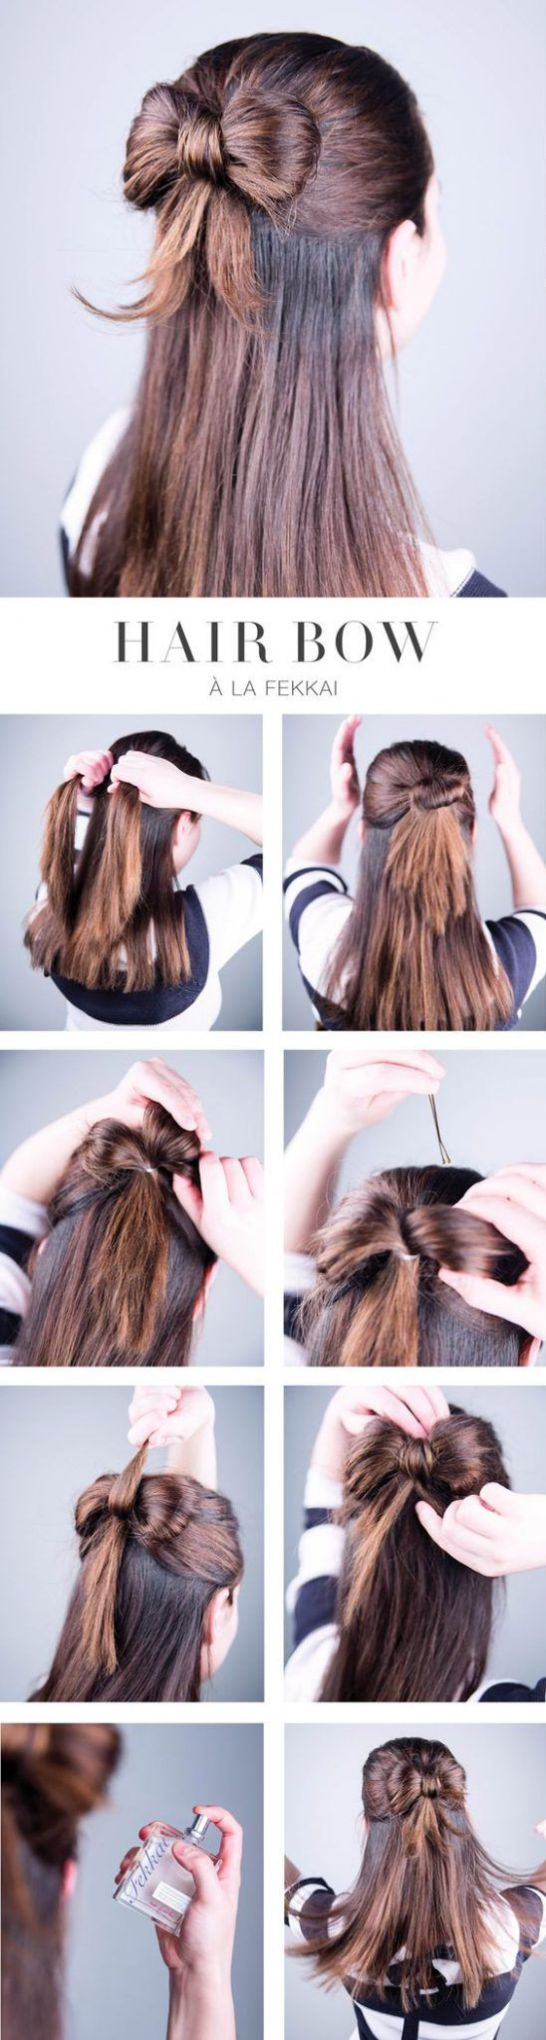 Easy half up half down hairstyles hair bow hair styles